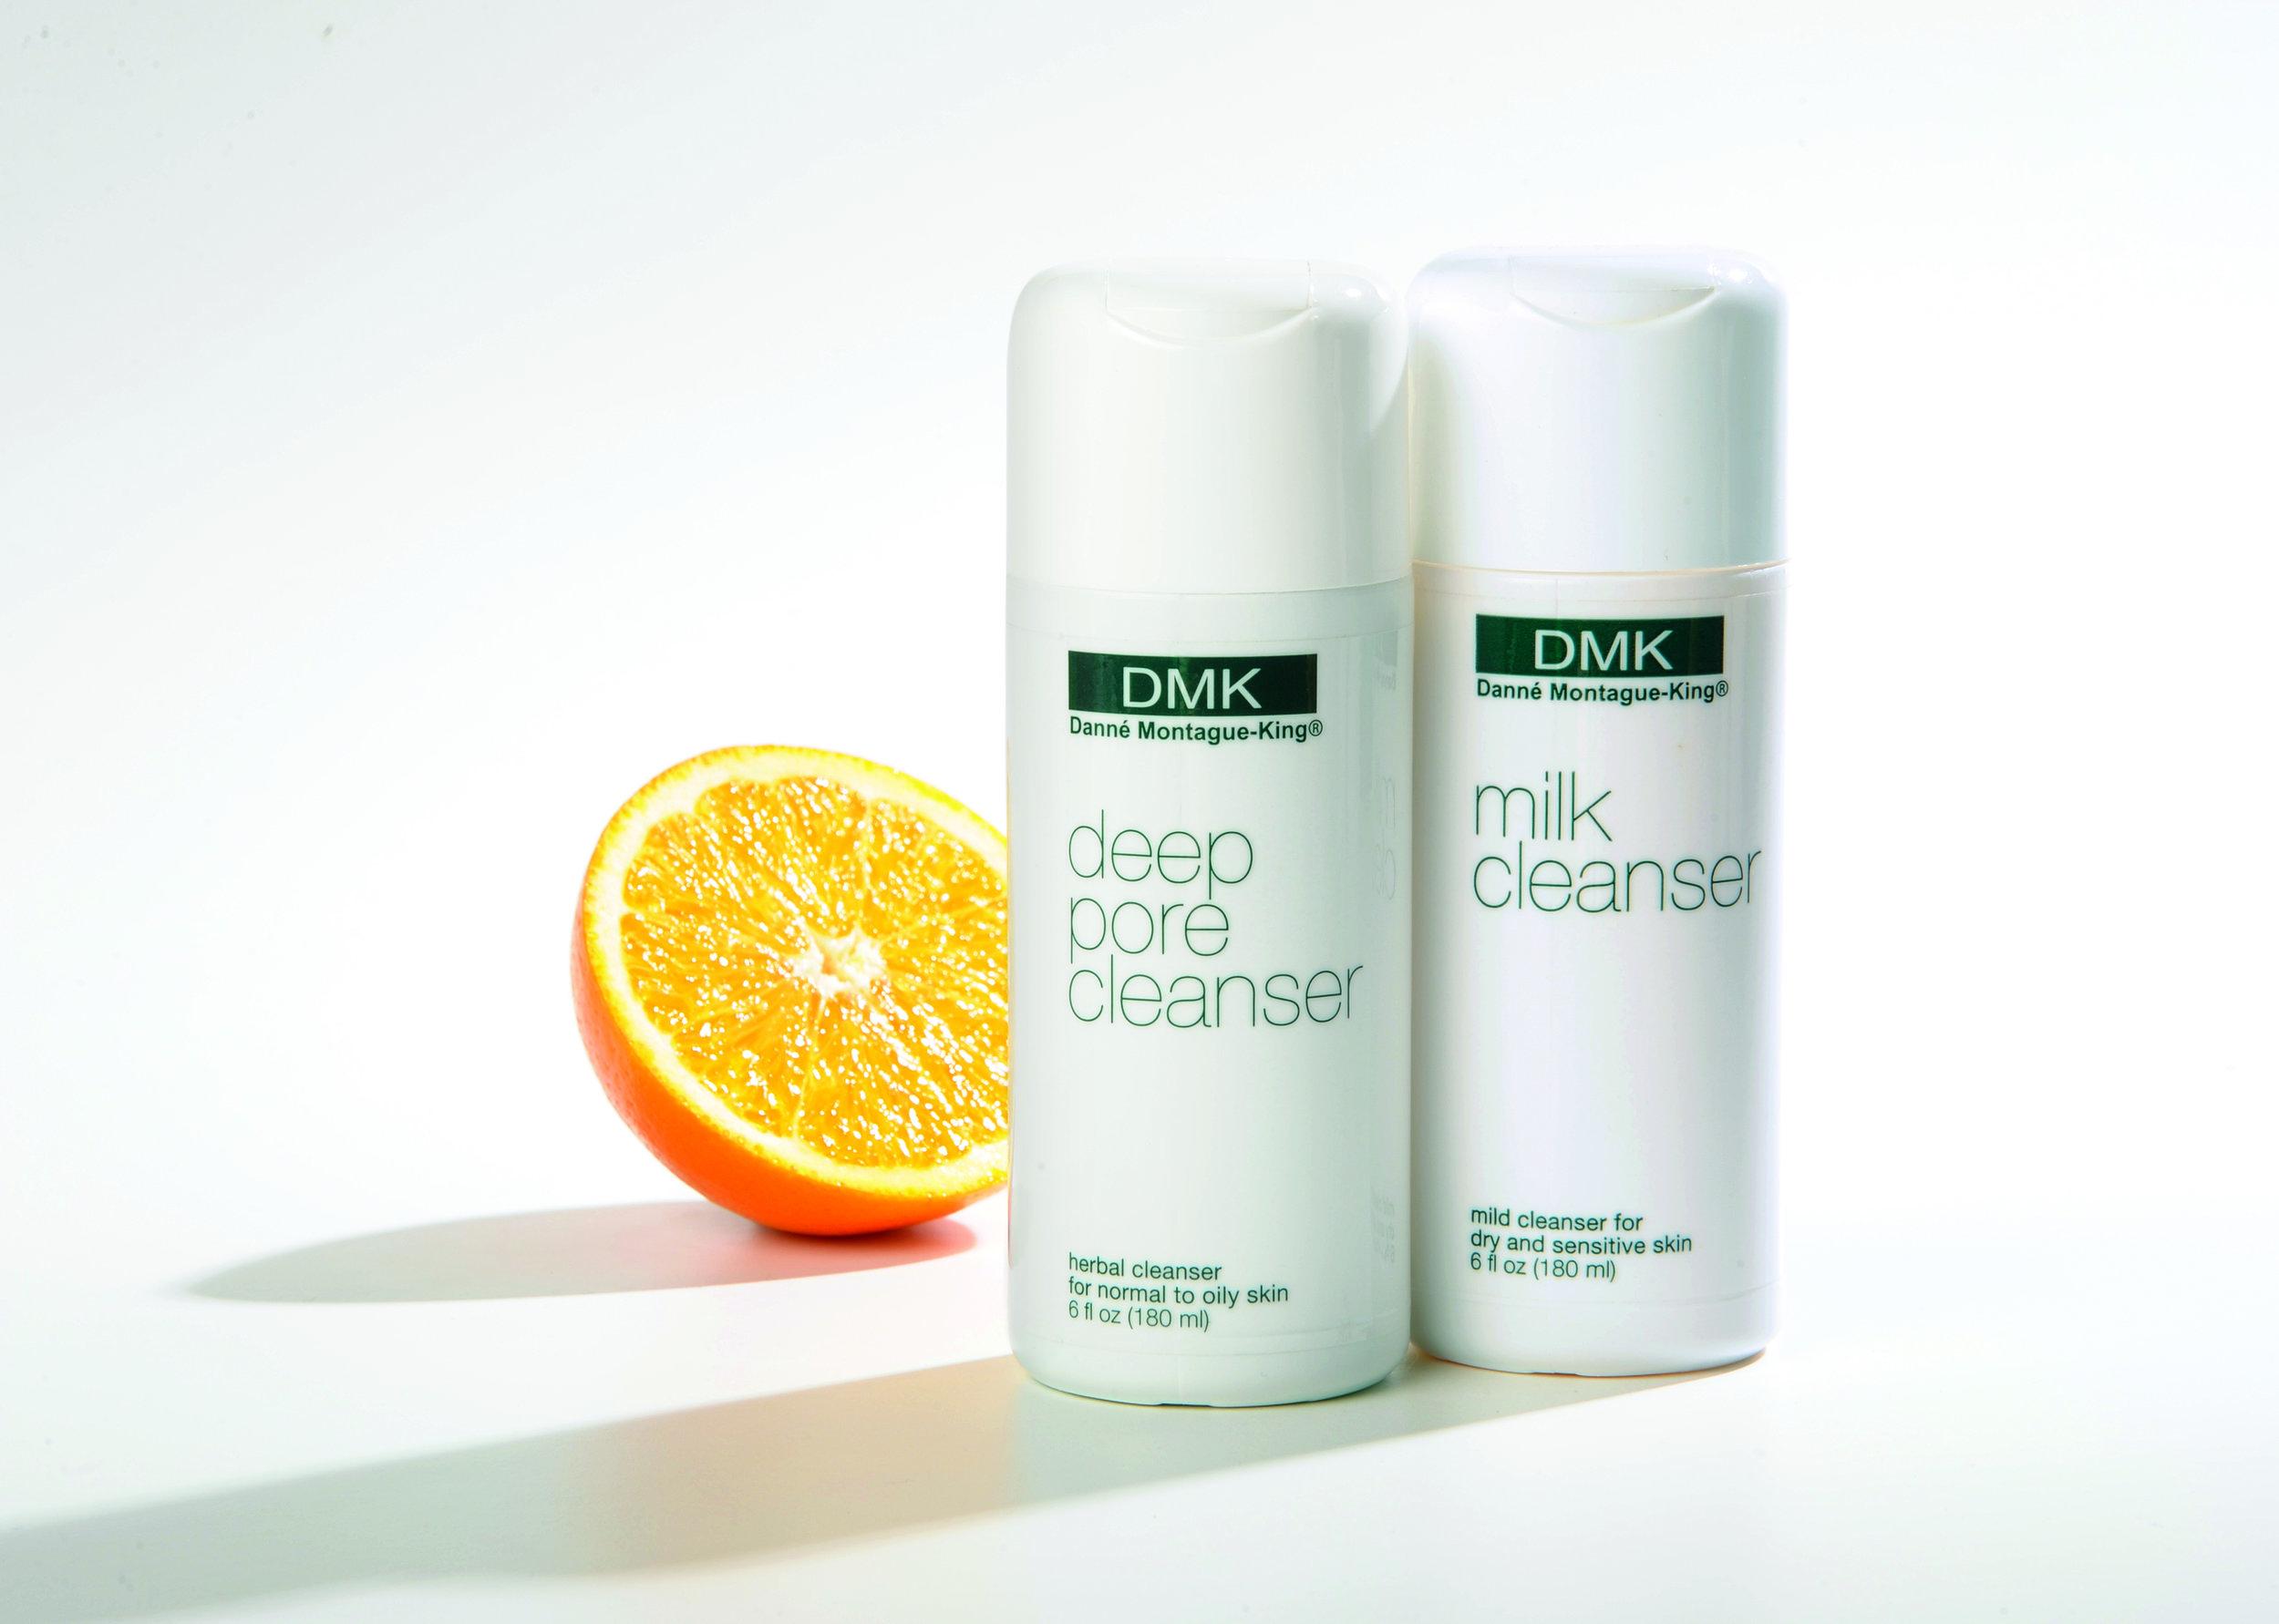 cleansers01.jpg